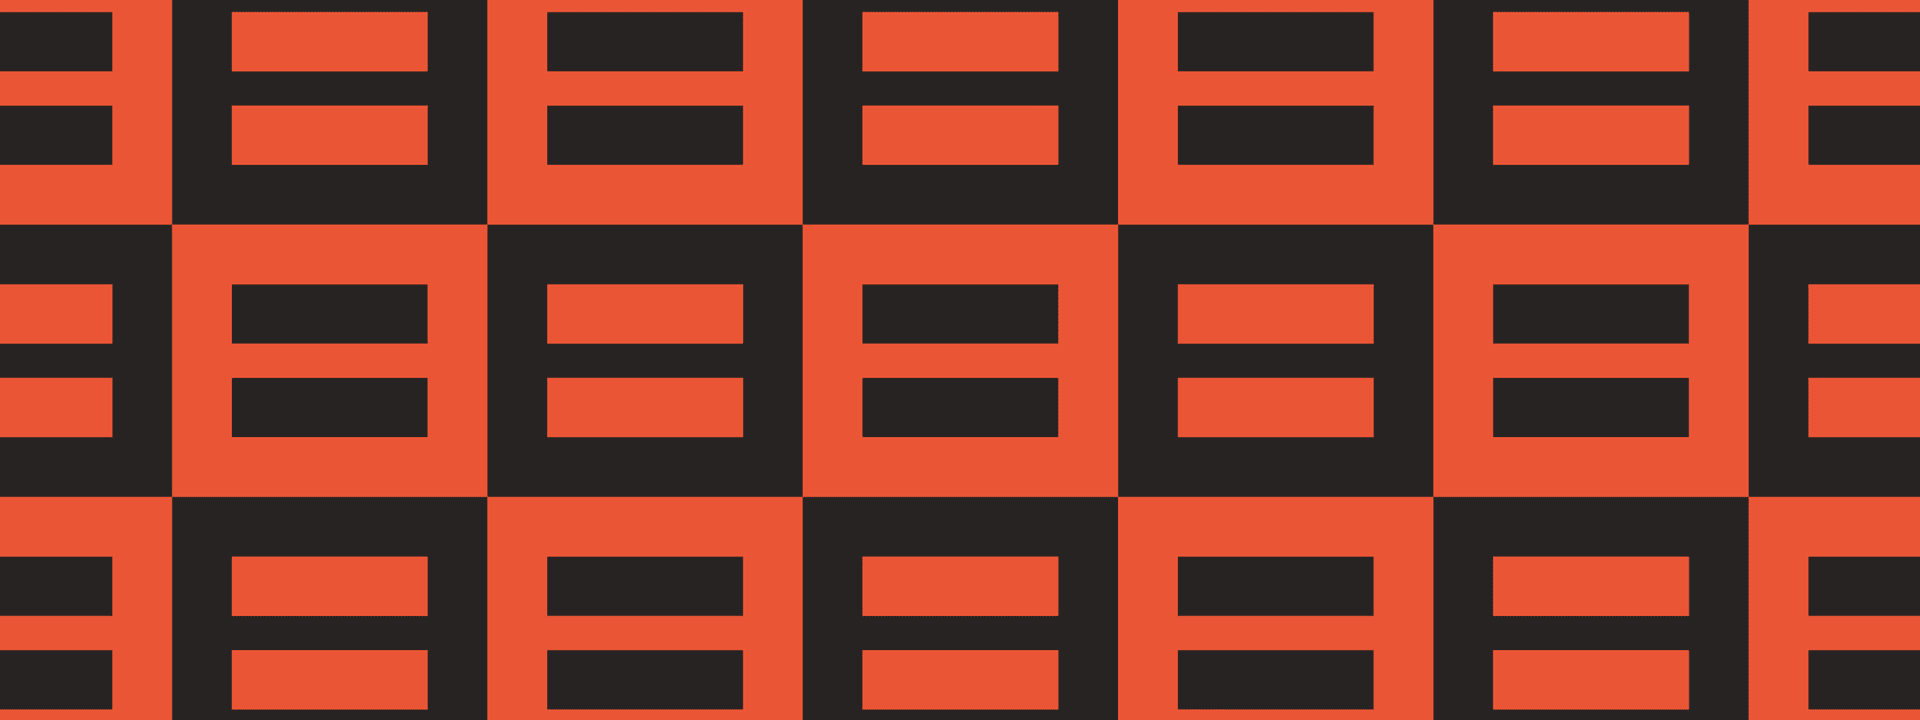 Branding Equ8 - Product pattern